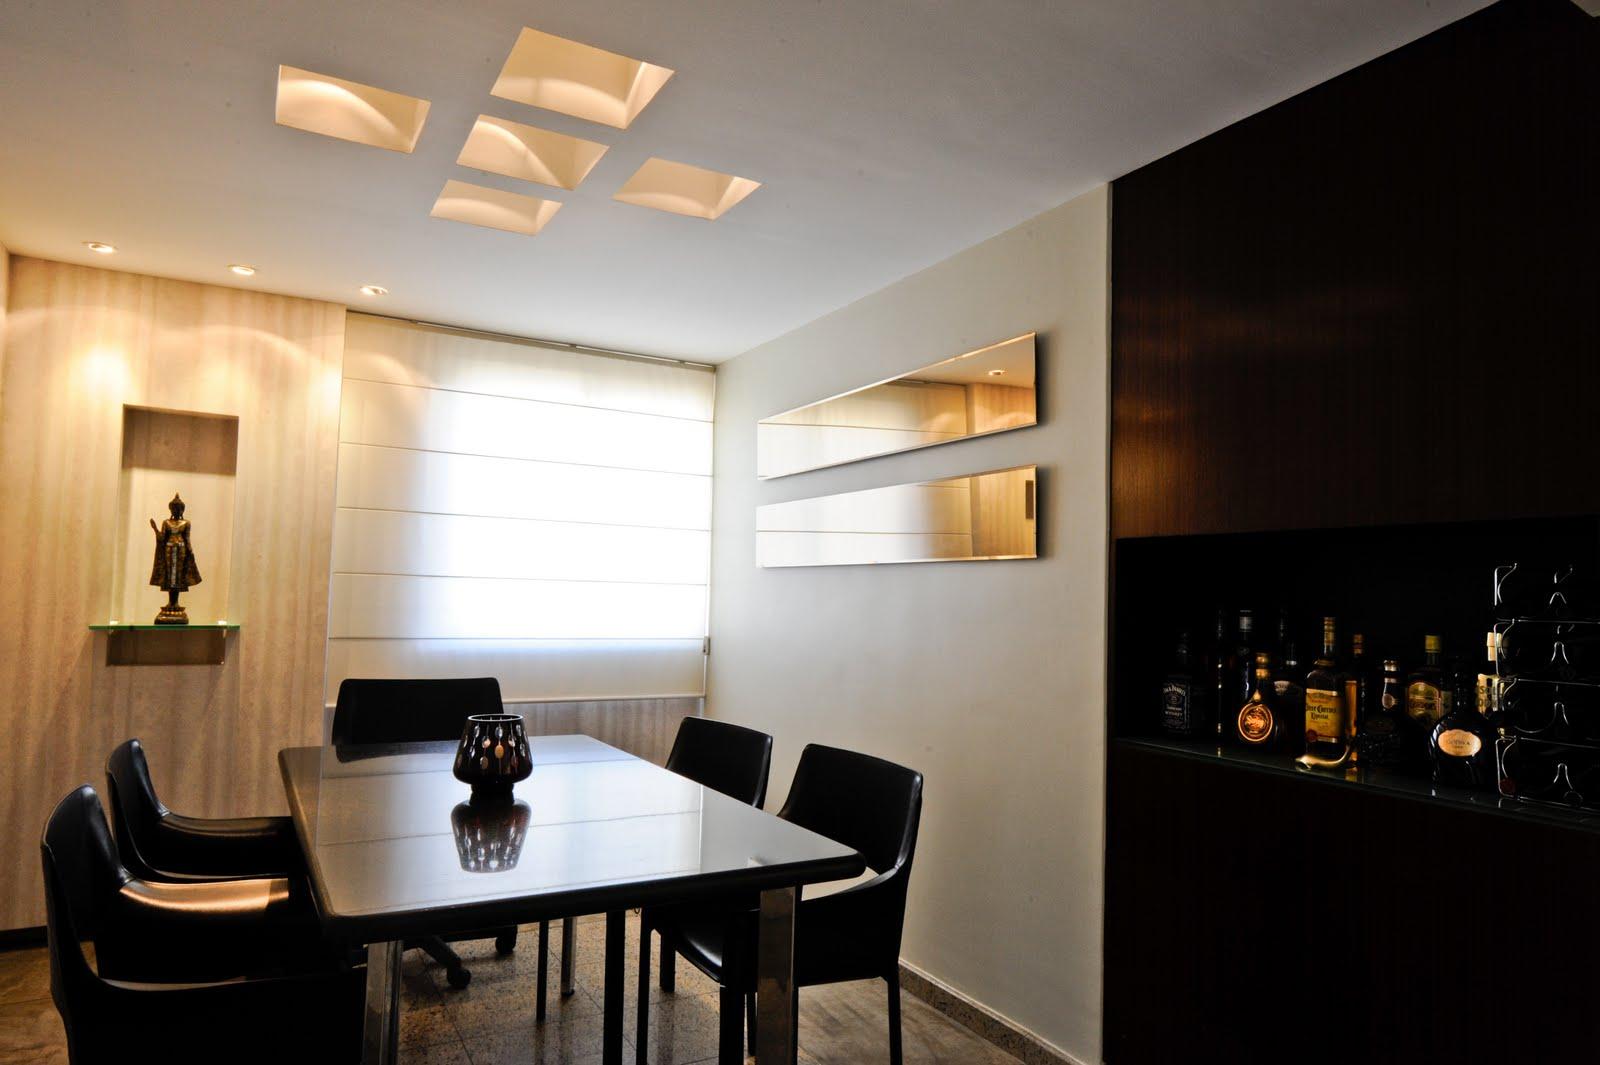 #986B33 Andréa Andrade: Sala de jantar Apartamento 2008 1600x1065 píxeis em Decoração Sala De Jantar Apartamento